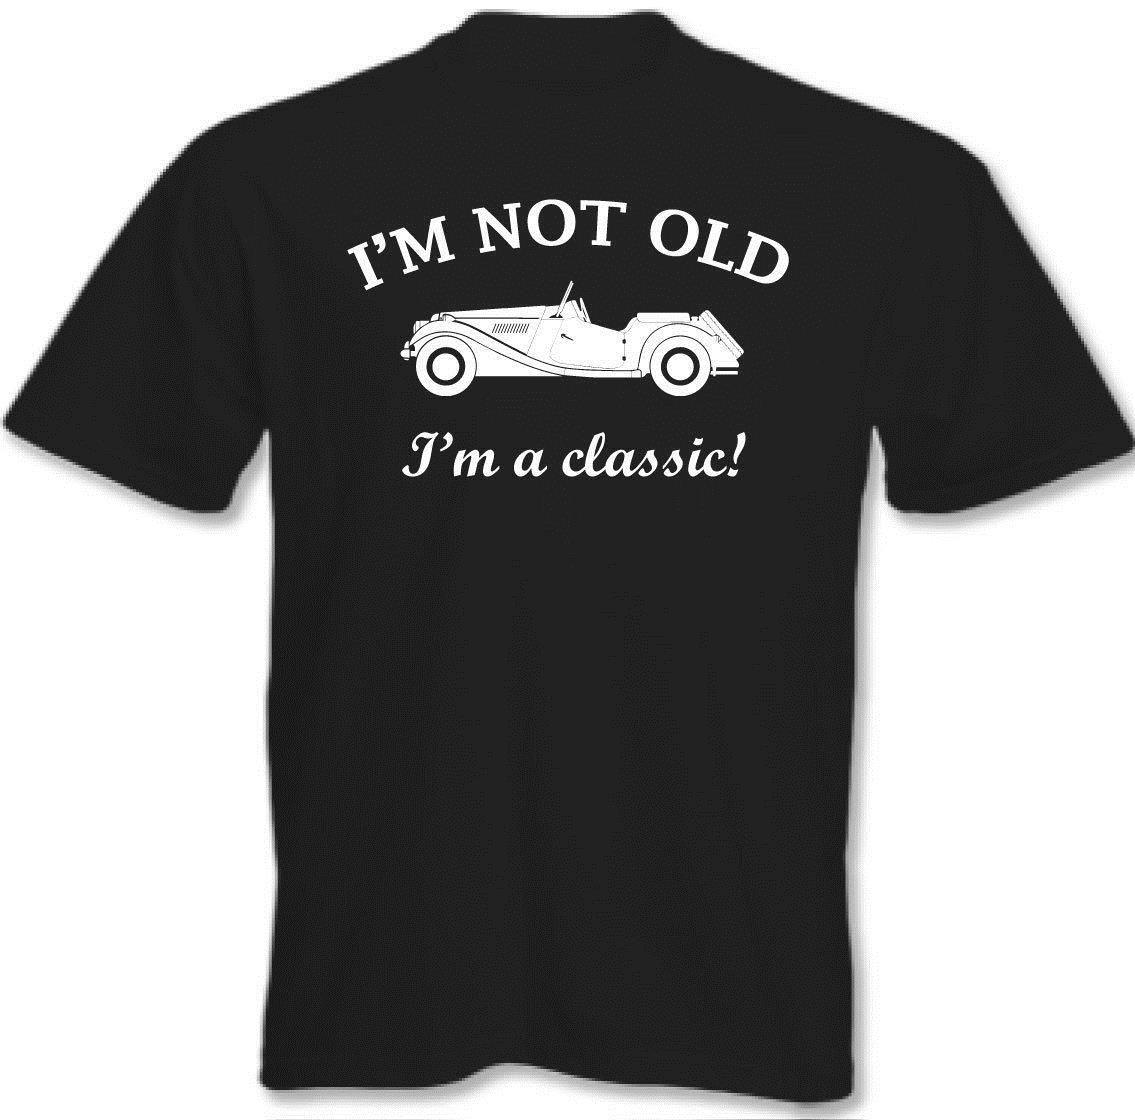 IM Not Old Mens Funny 21st 30th 40th 50th 60th 70th 80th 90th Birthday T Shirt Print Short Sleeve Tee Buy Designs From